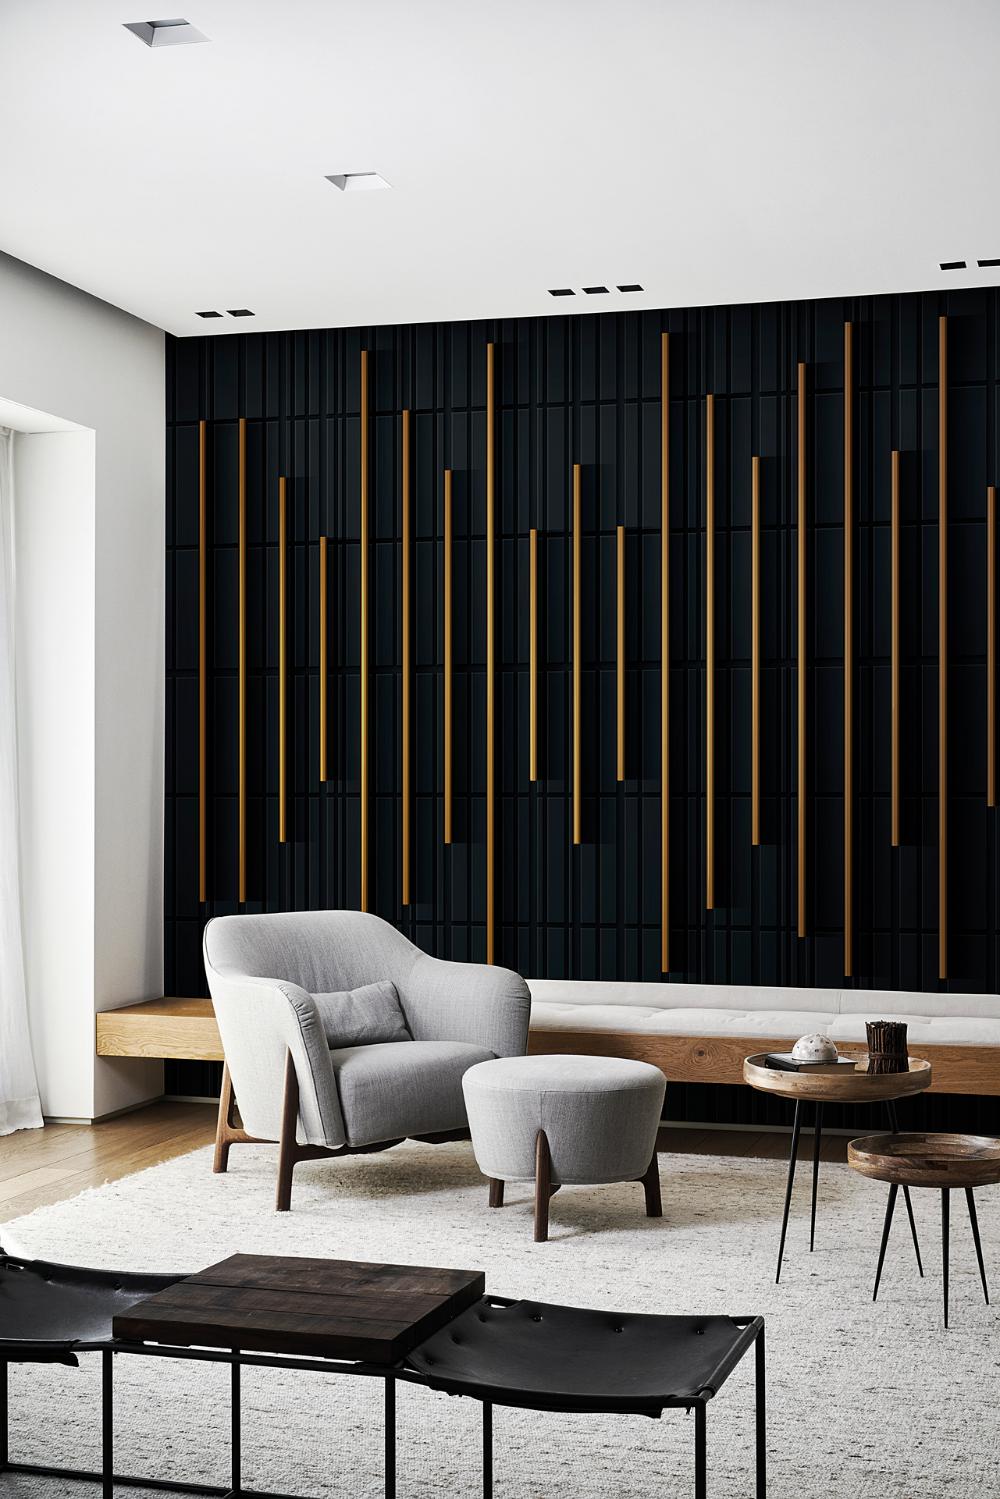 New Wave Londonart Feature Wall Bedroom Interior Wall Design Feature Wall Design